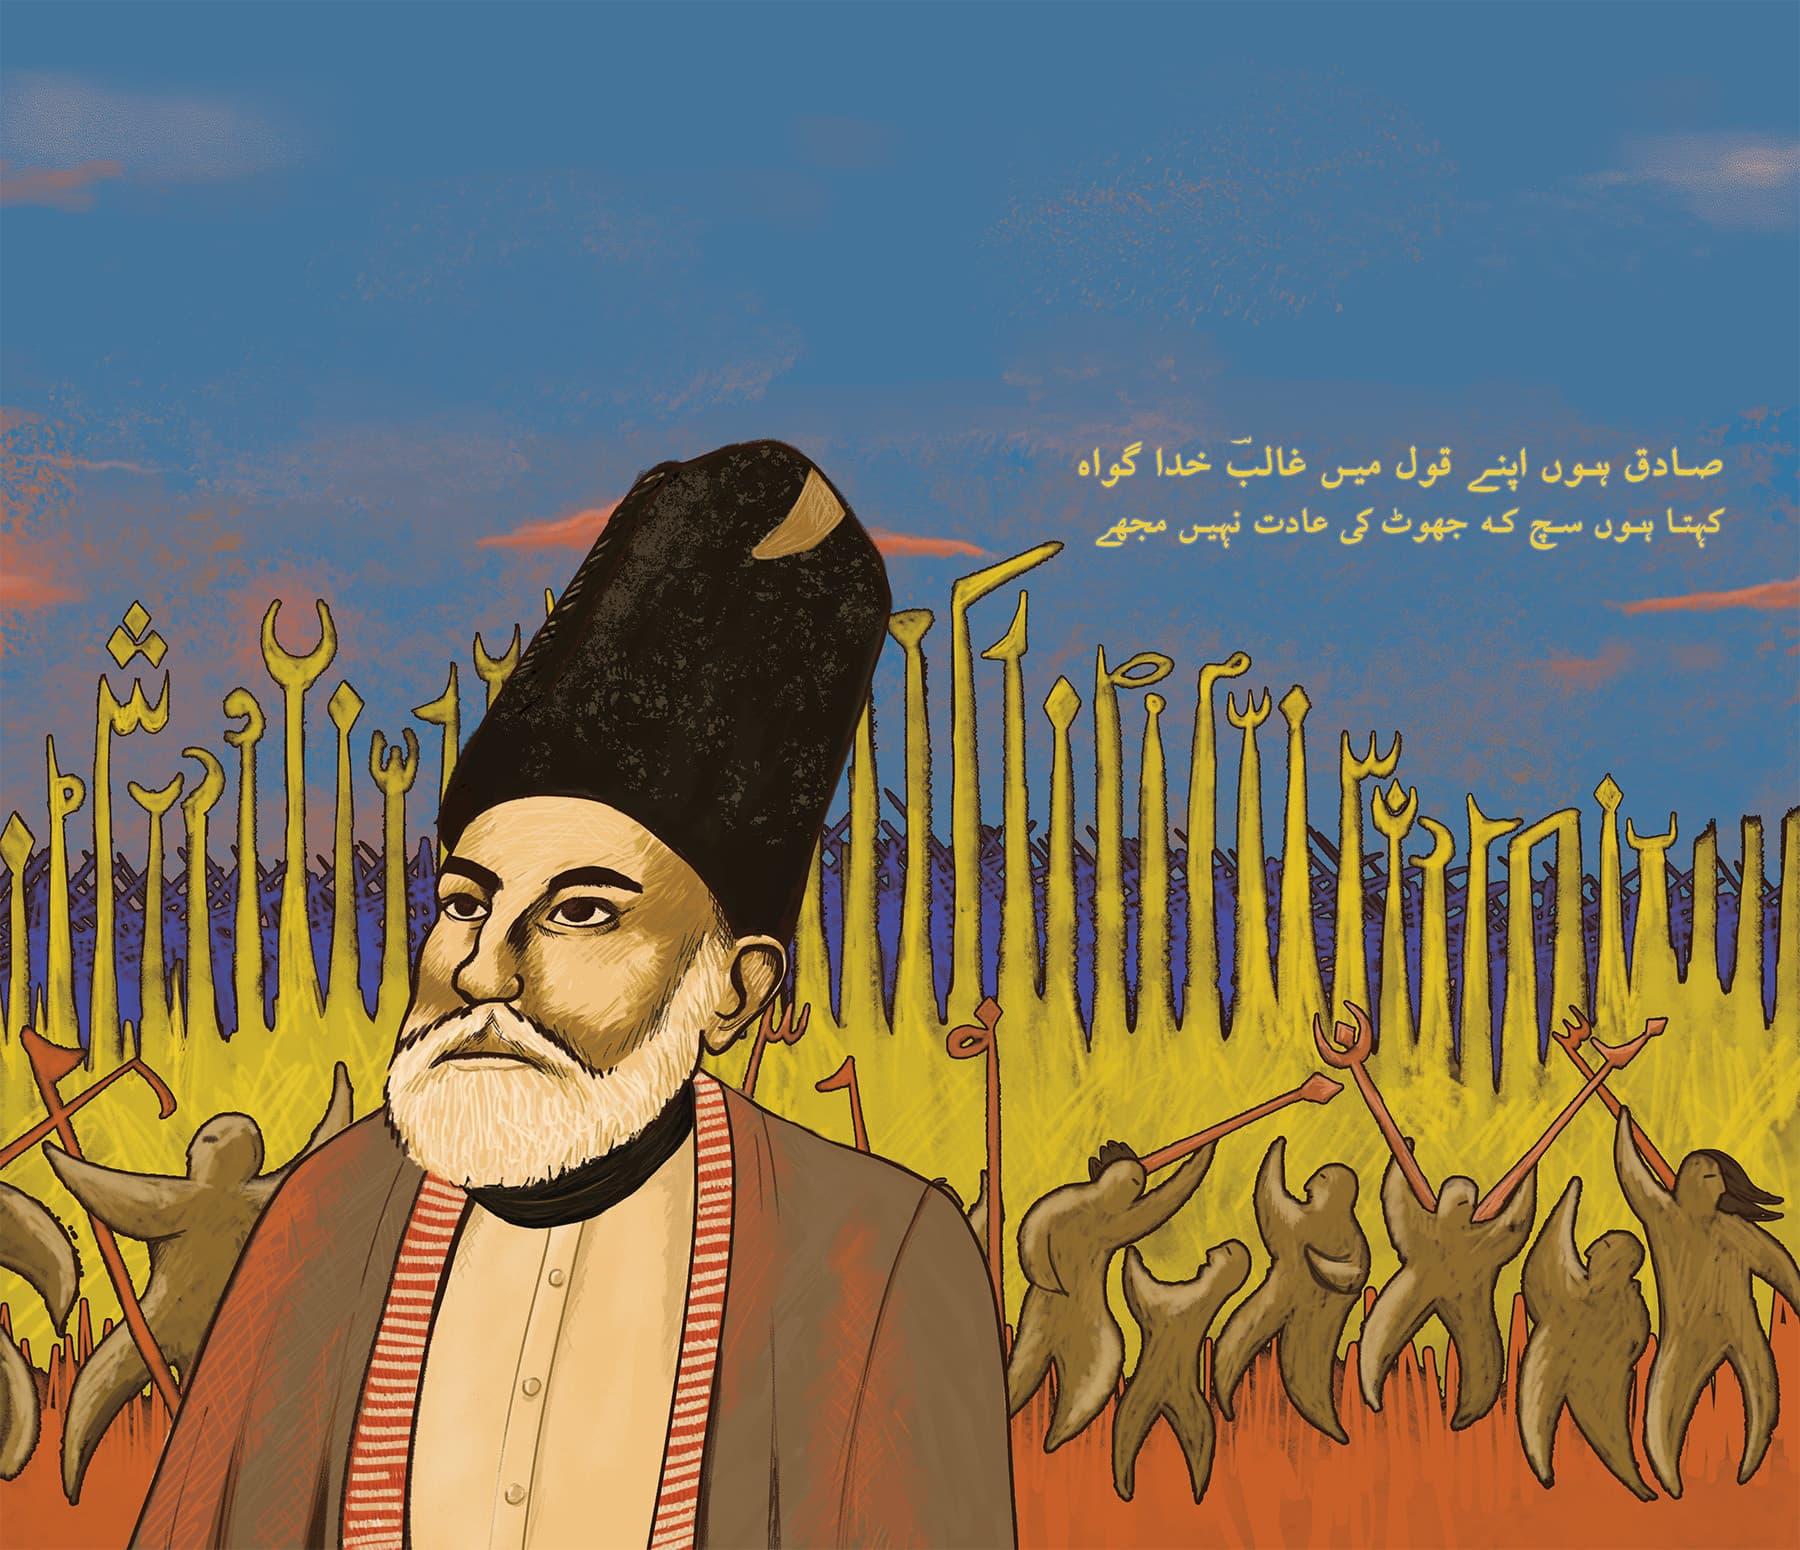 Illustration by Samiah Bilal